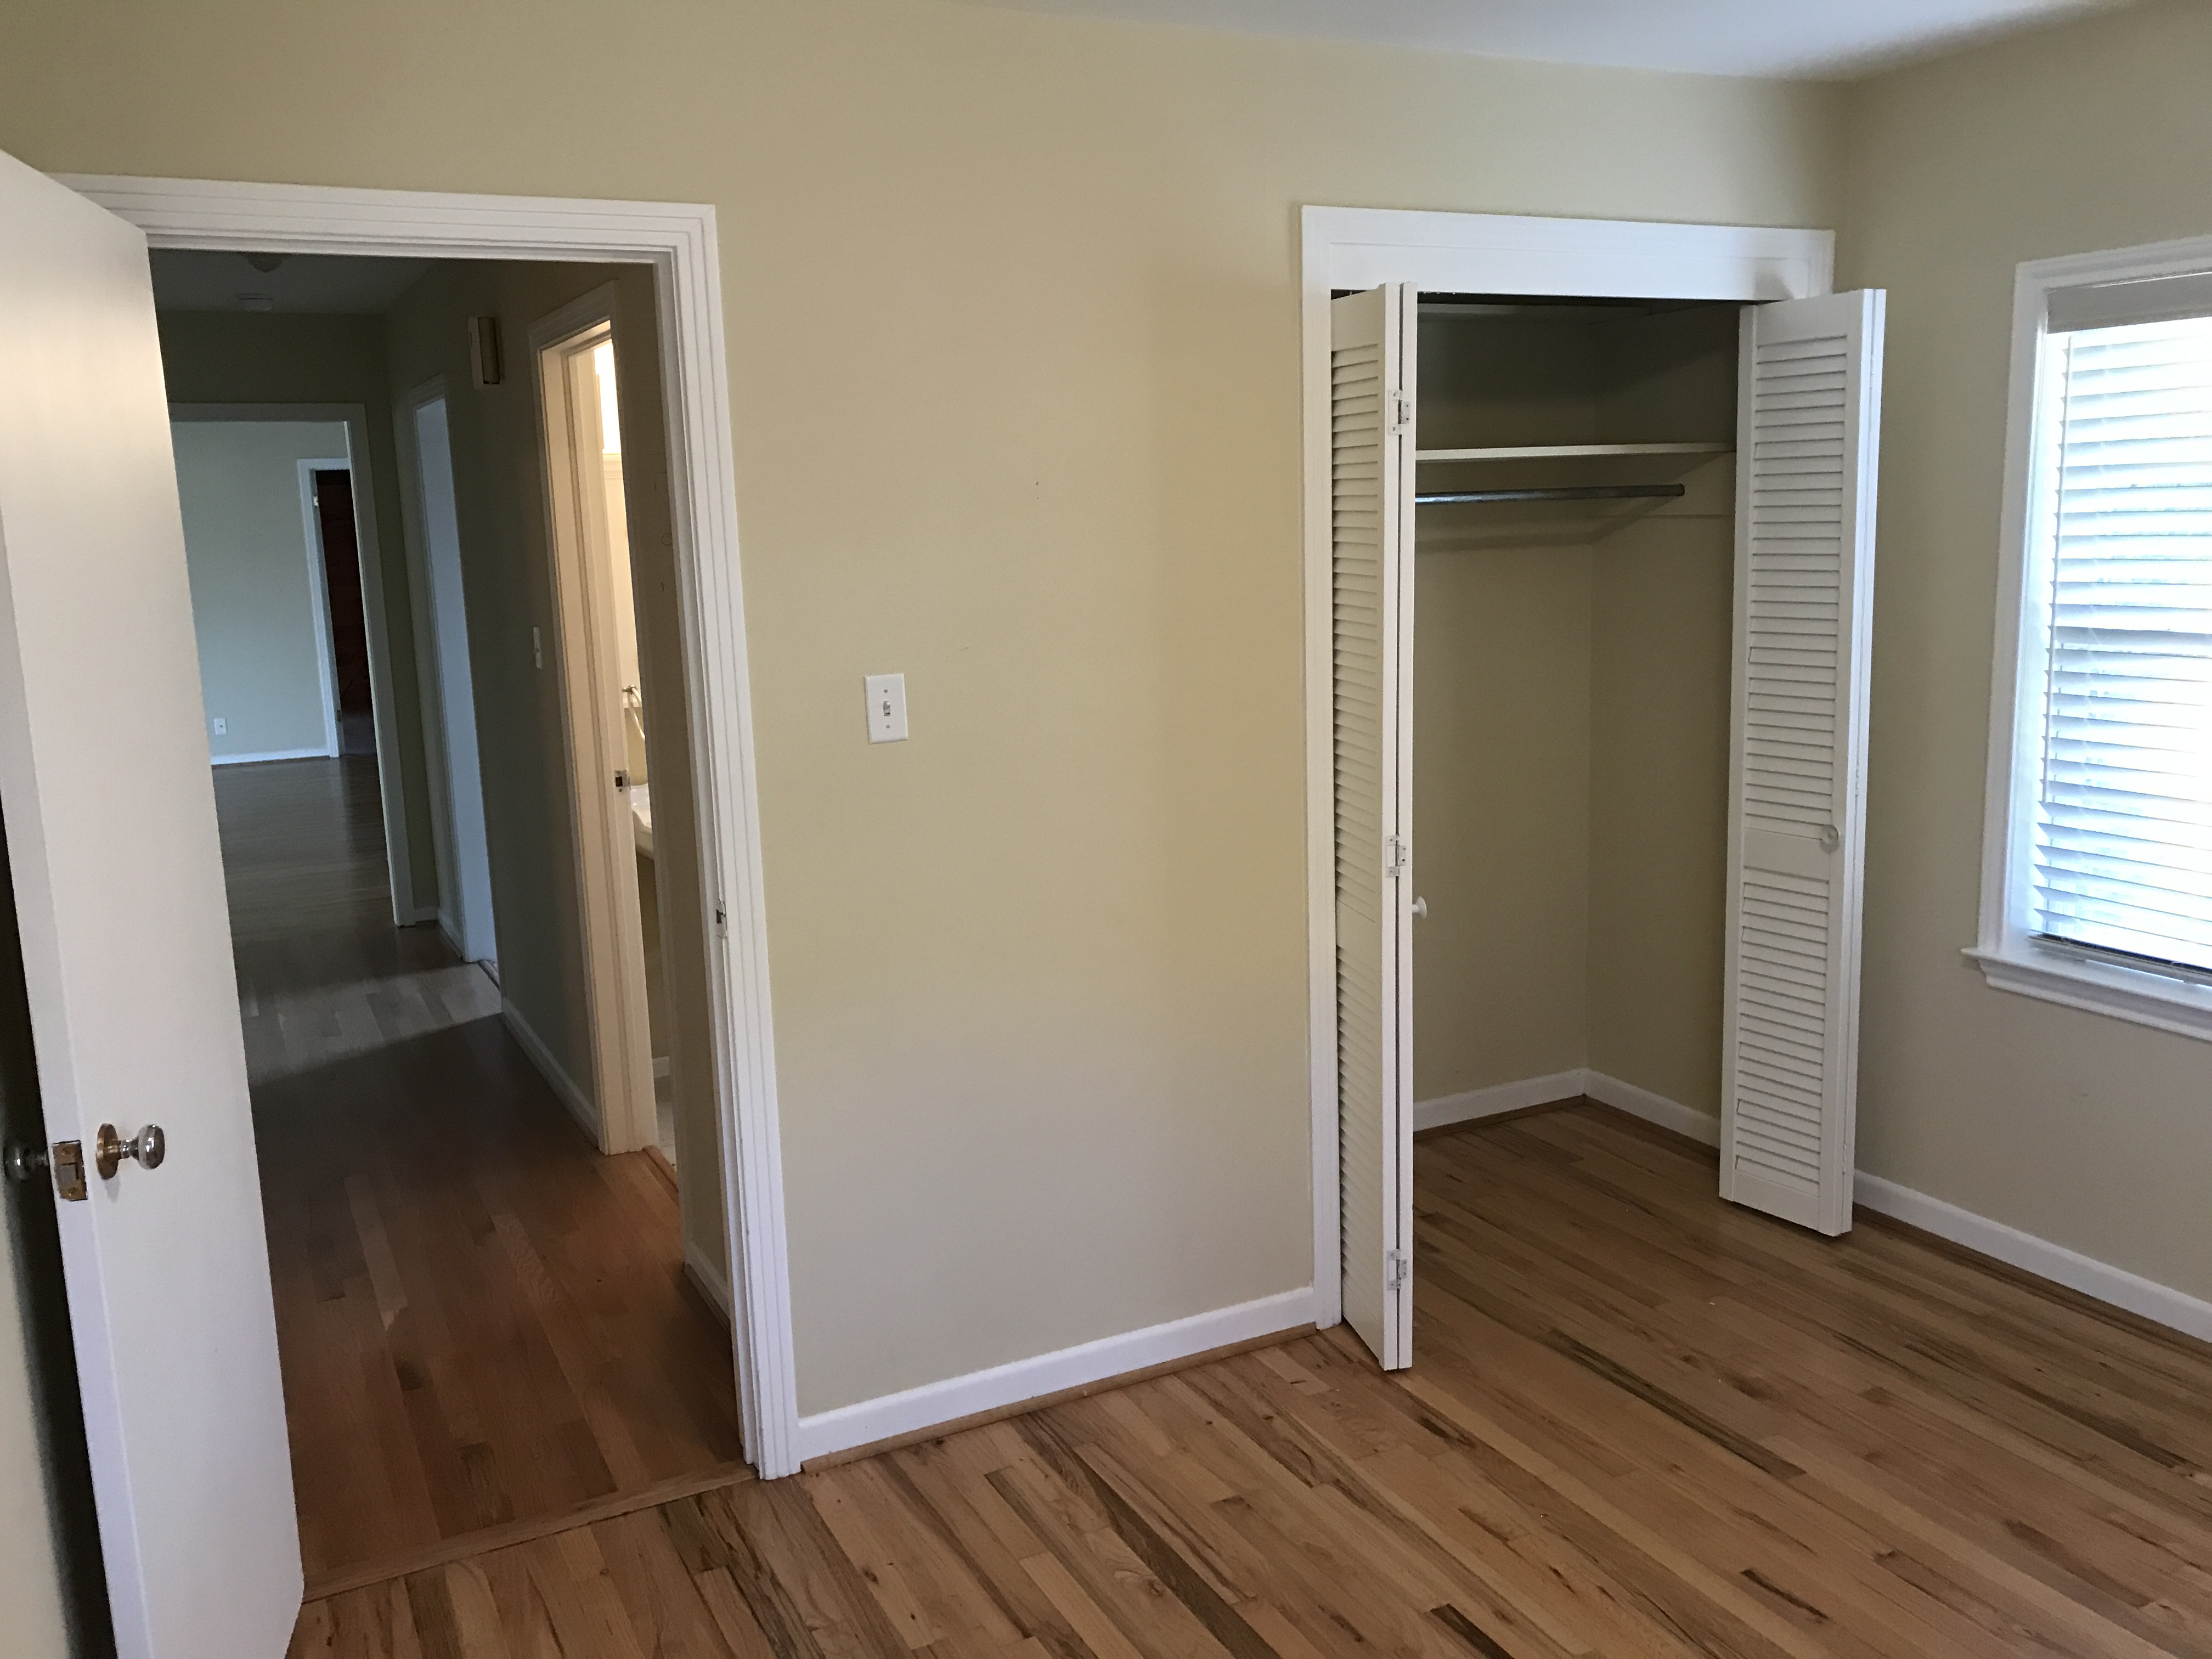 Bedroom/Closet Before